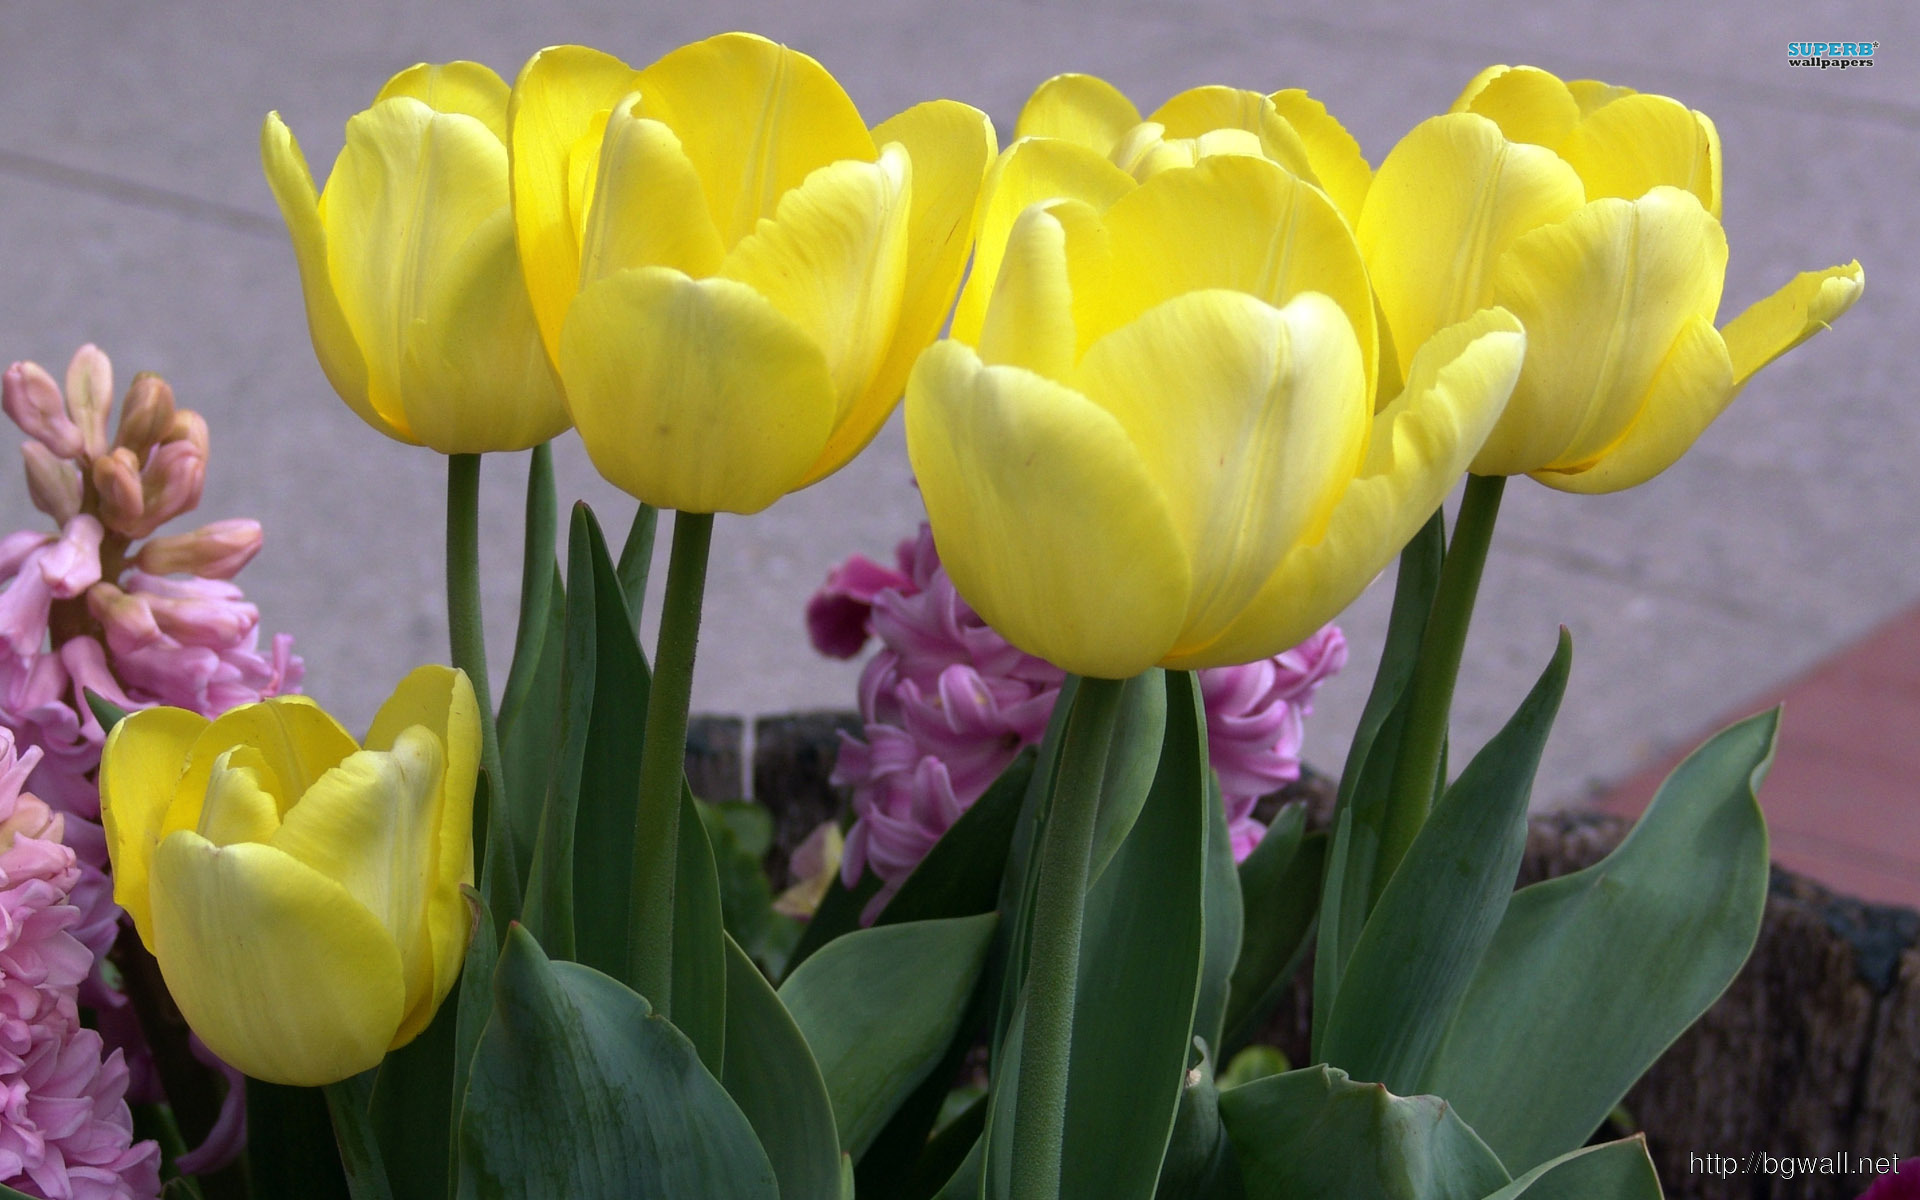 3d Yamaha Wallpaper Yellow Tulips Wallpaper Background Wallpaper Hd